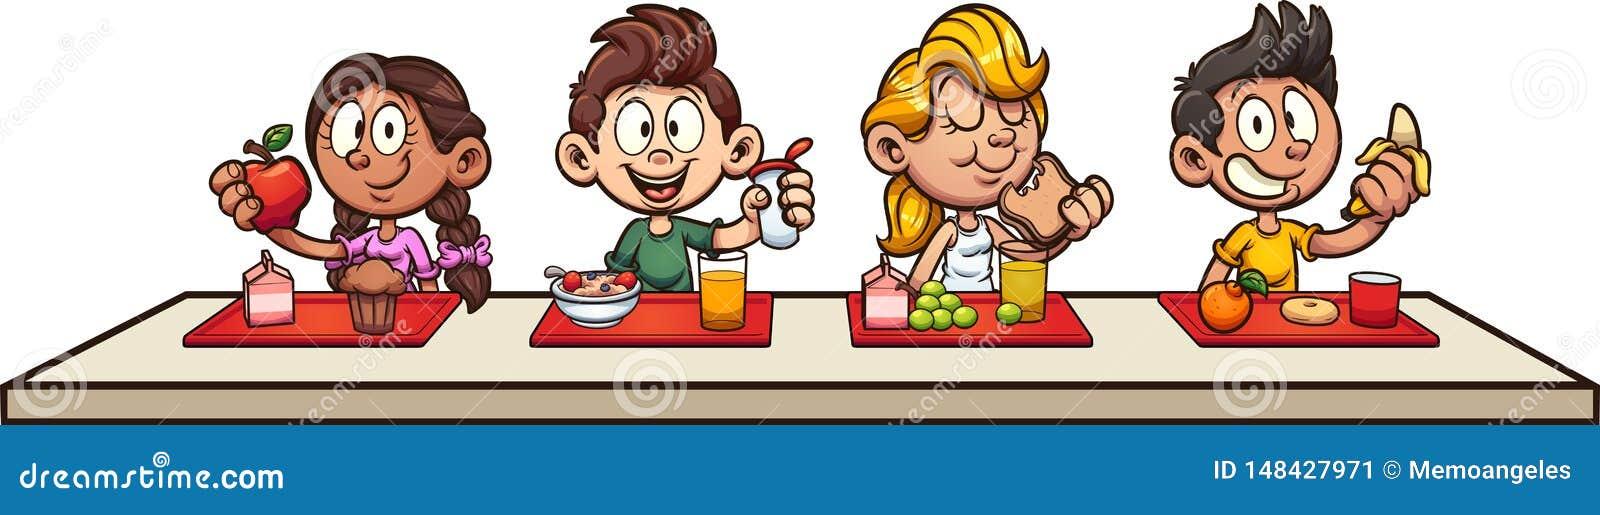 Cartoon Kids Eating Breakfast At School Stock Vector ...